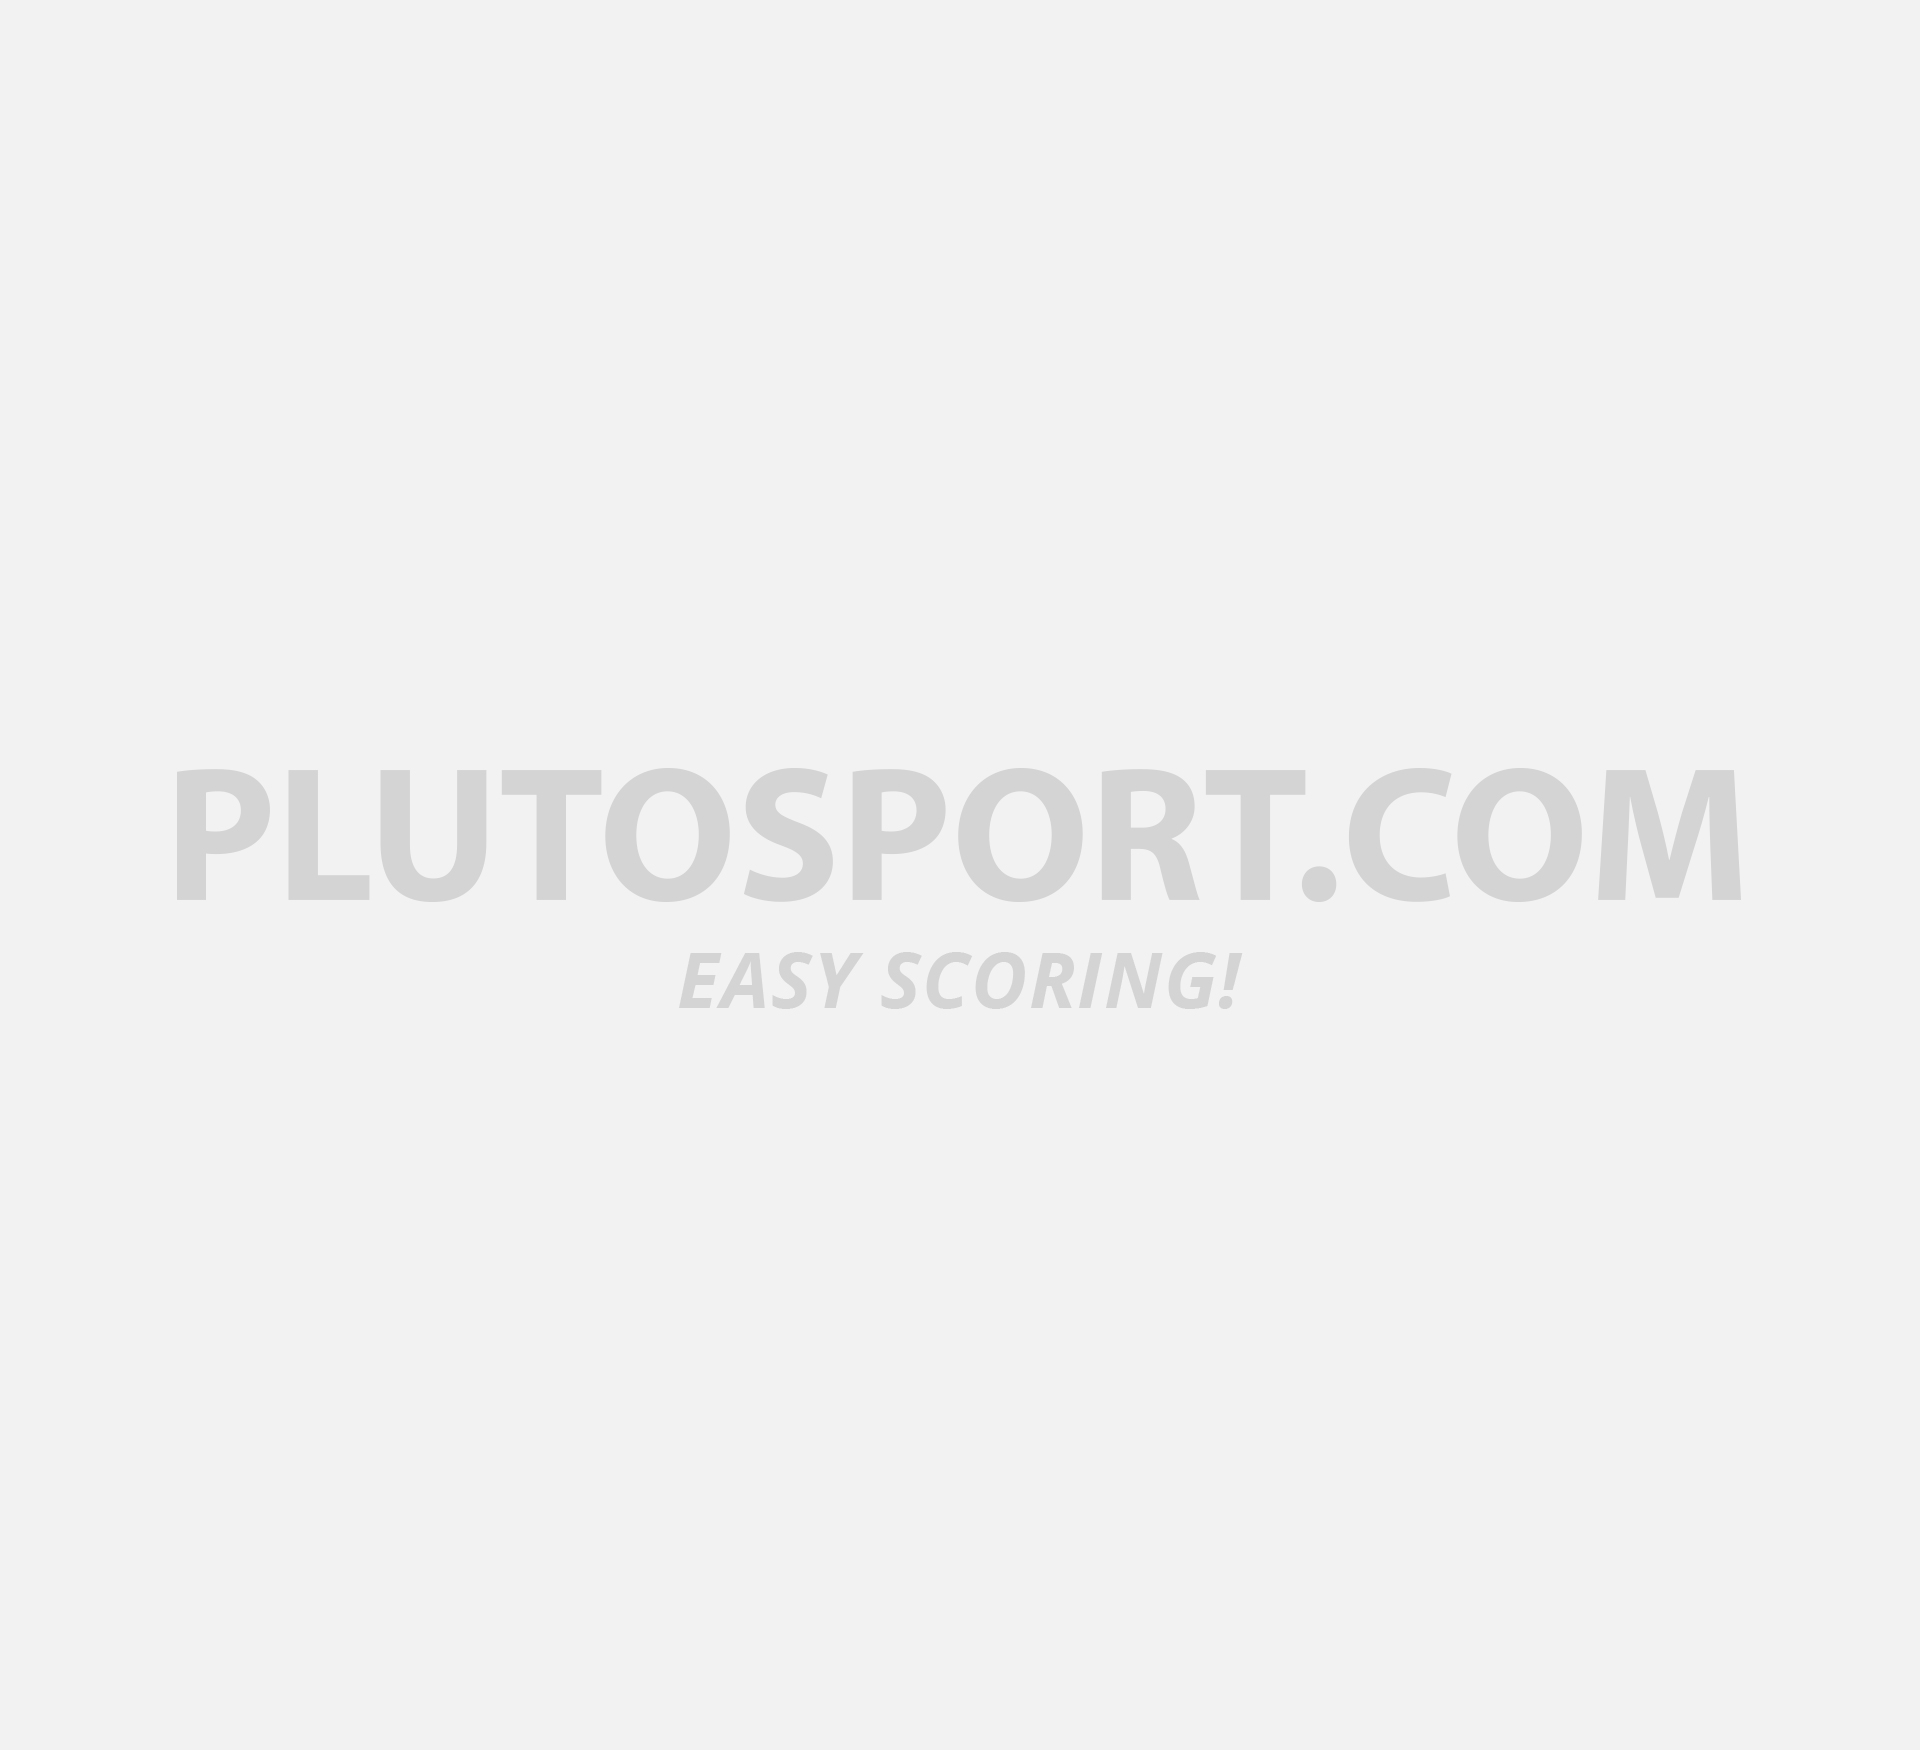 Asics Gel-Blackheath 7 Hockeyshoe Women